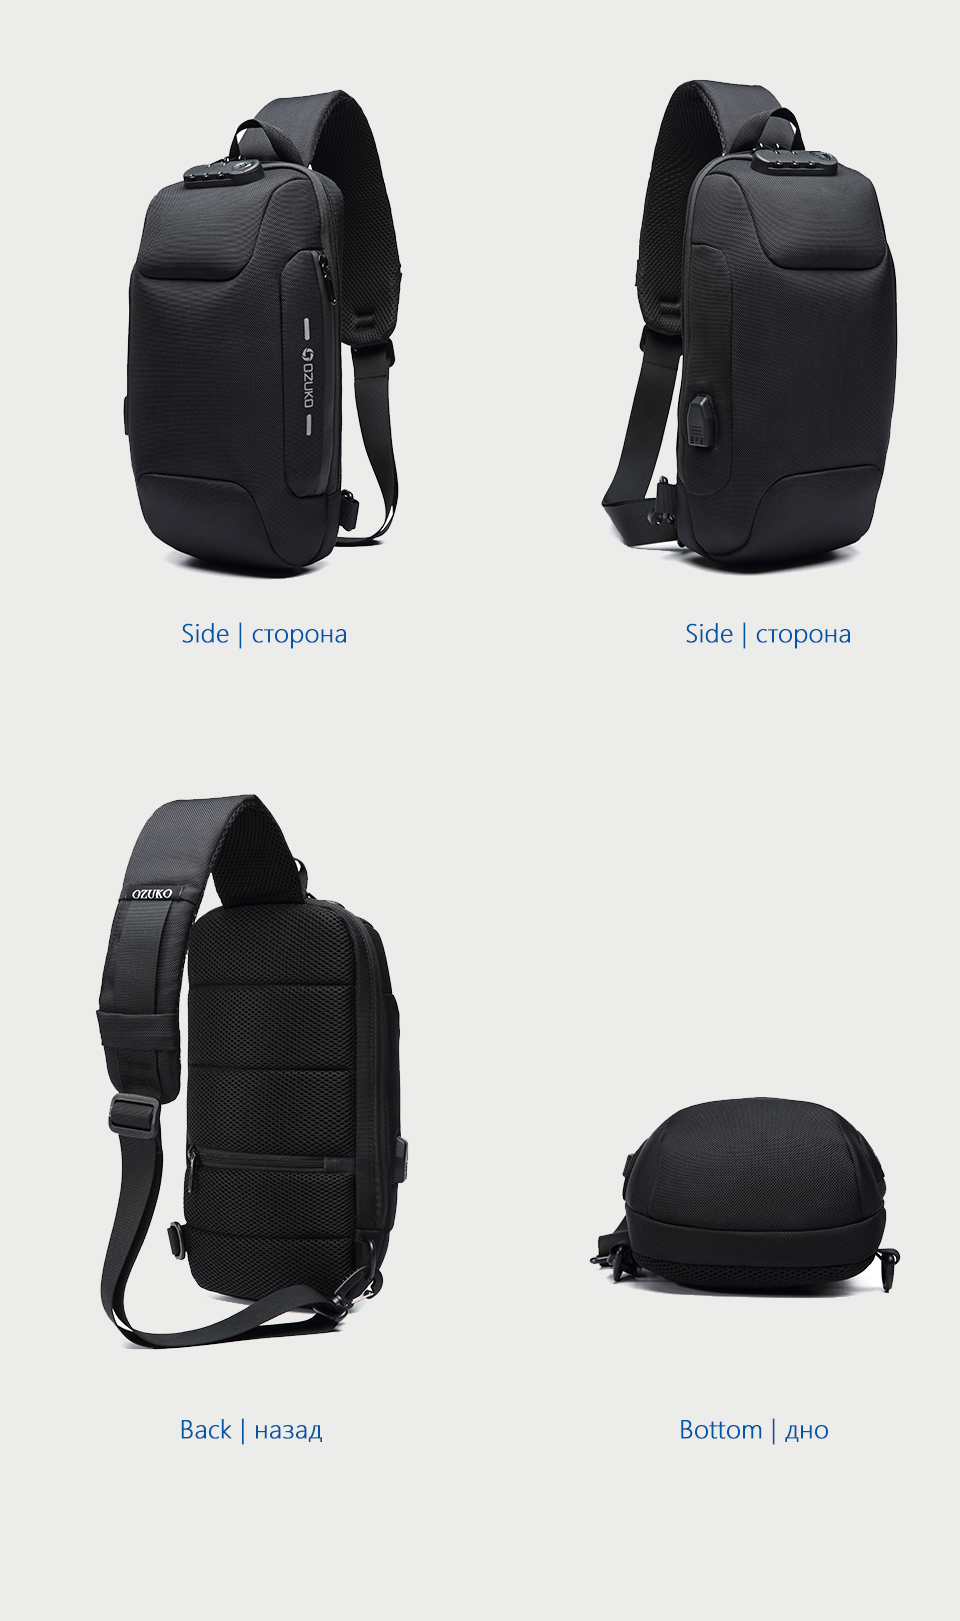 OZUKO 2019 New Multifunction Crossbody Bag for Men Anti-theft Shoulder Messenger Bags Male Waterproof Short Trip Chest Bag Pack 12